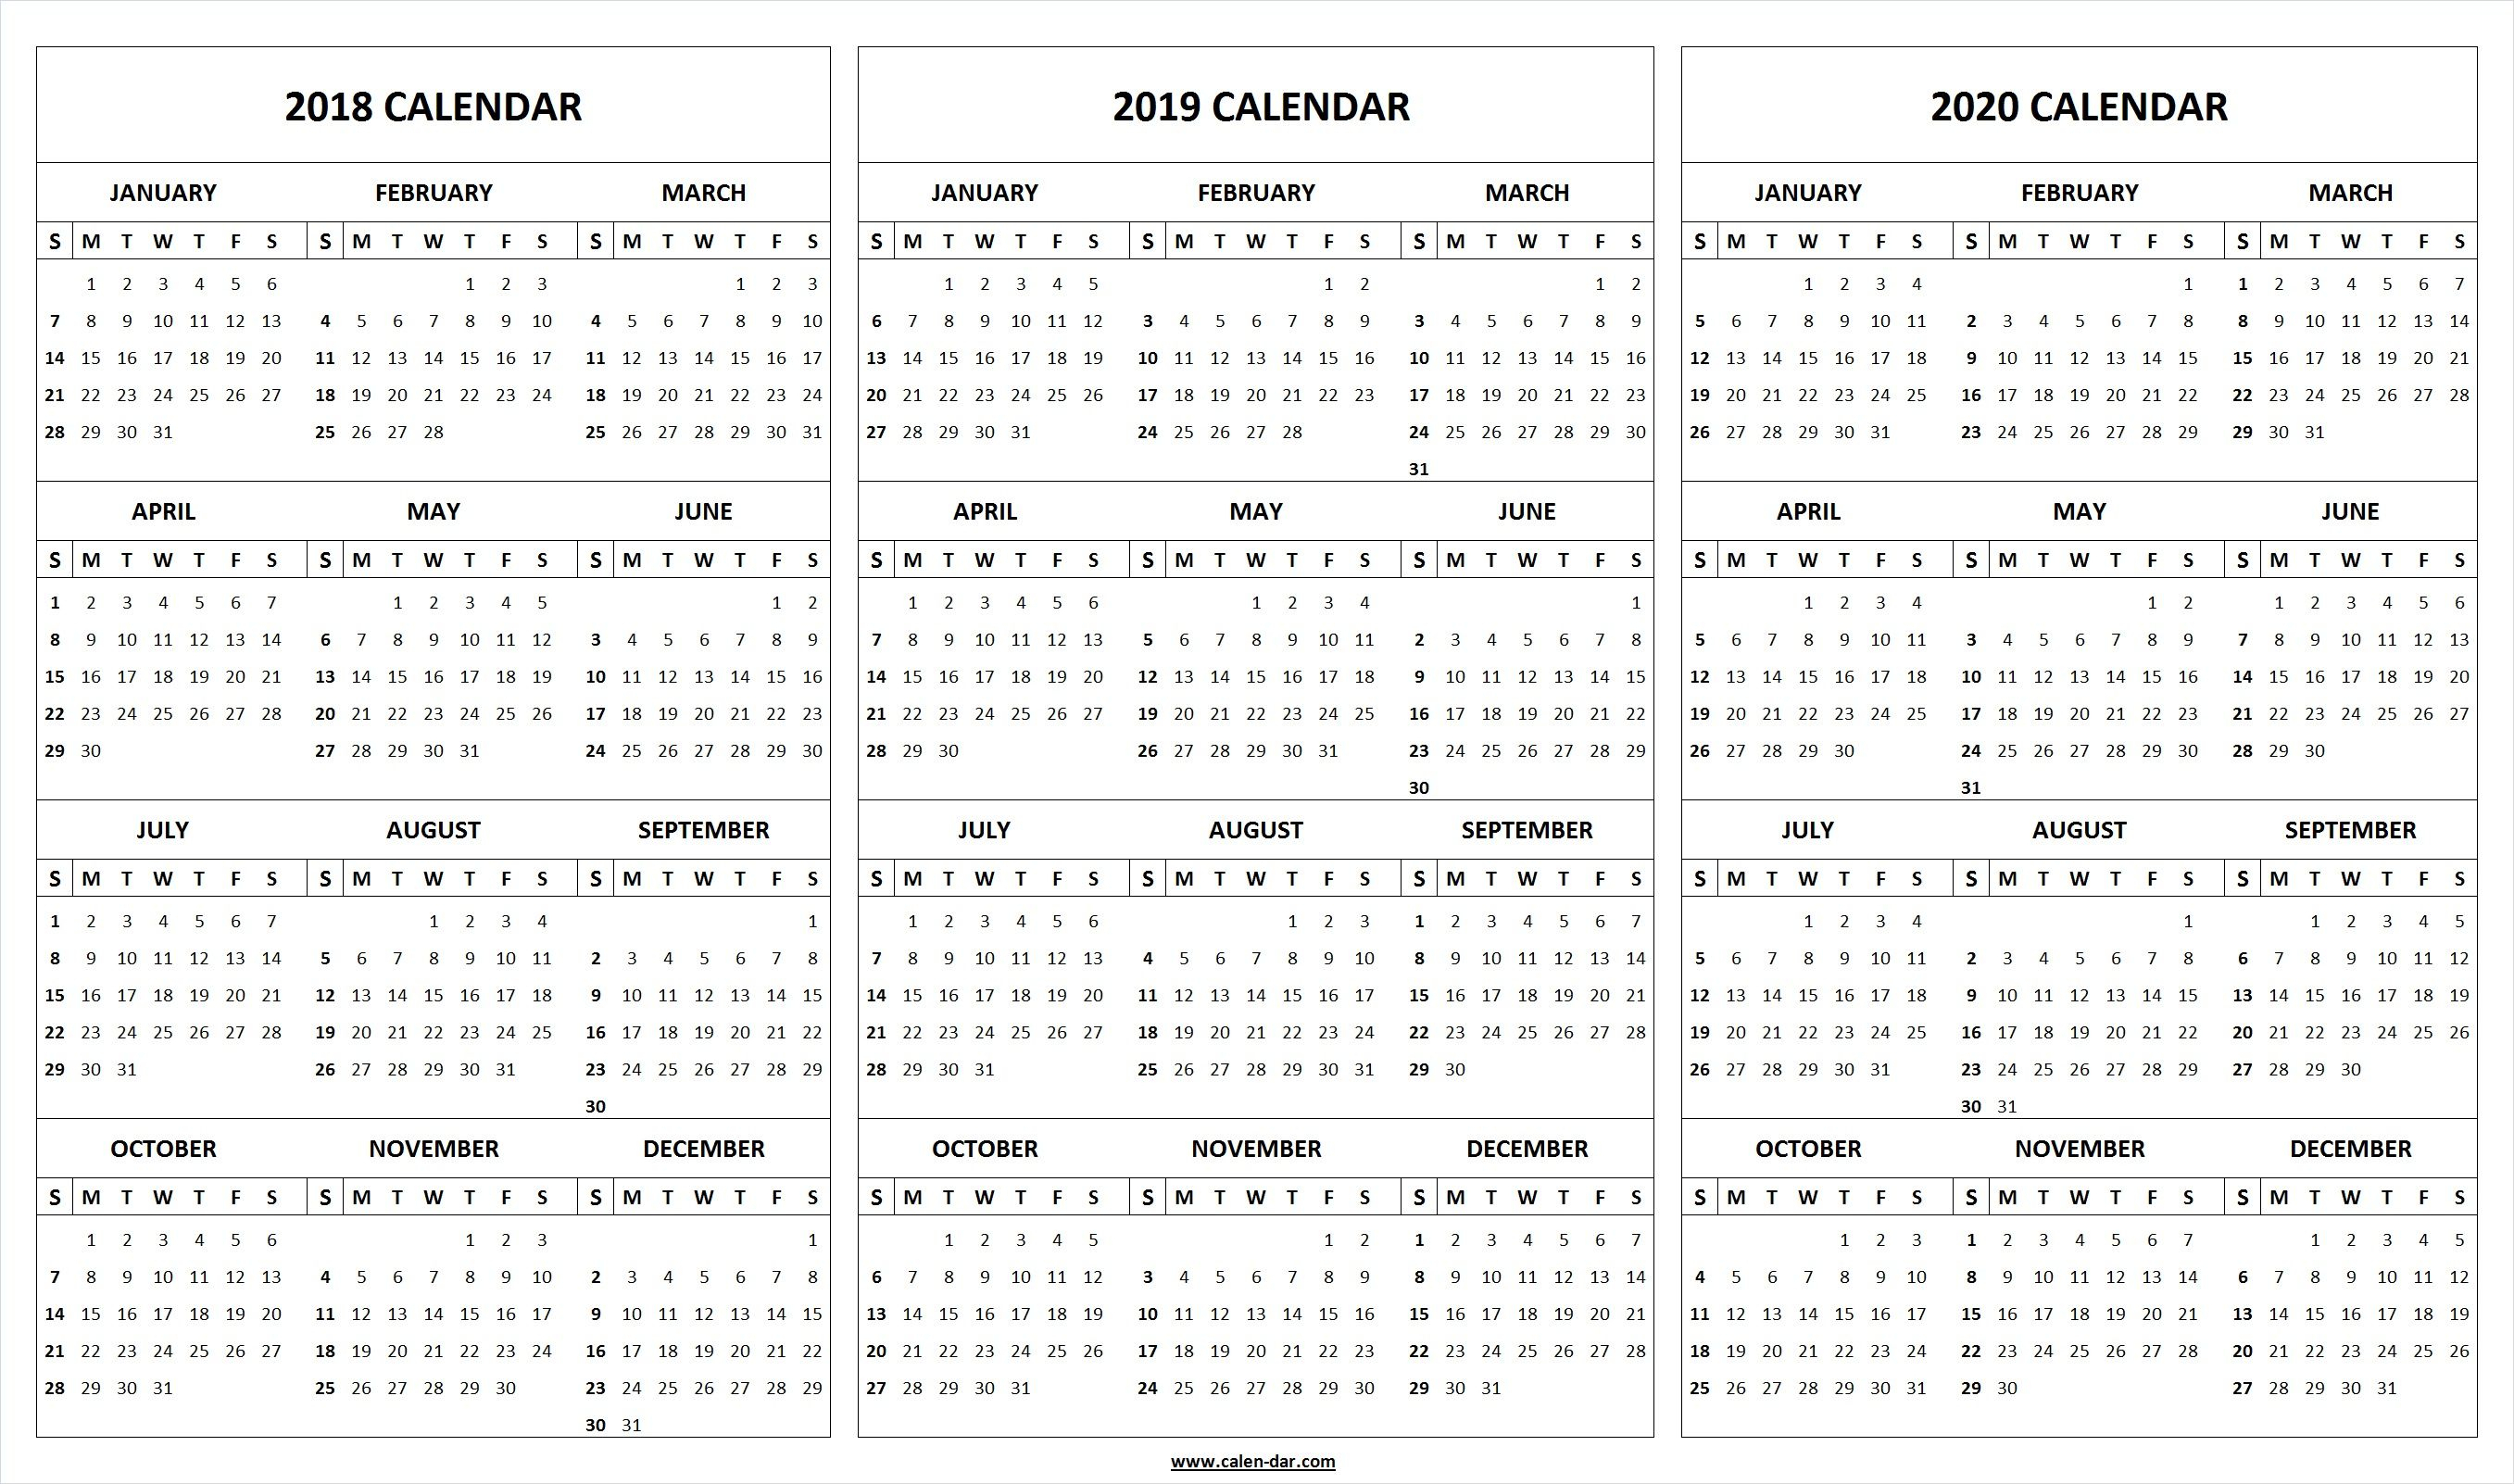 Print Blank 2018 2019 2020 Calendar Template | Organize! | 2019 with regard to 3 Year Calendar Printable 2018 2019 2020